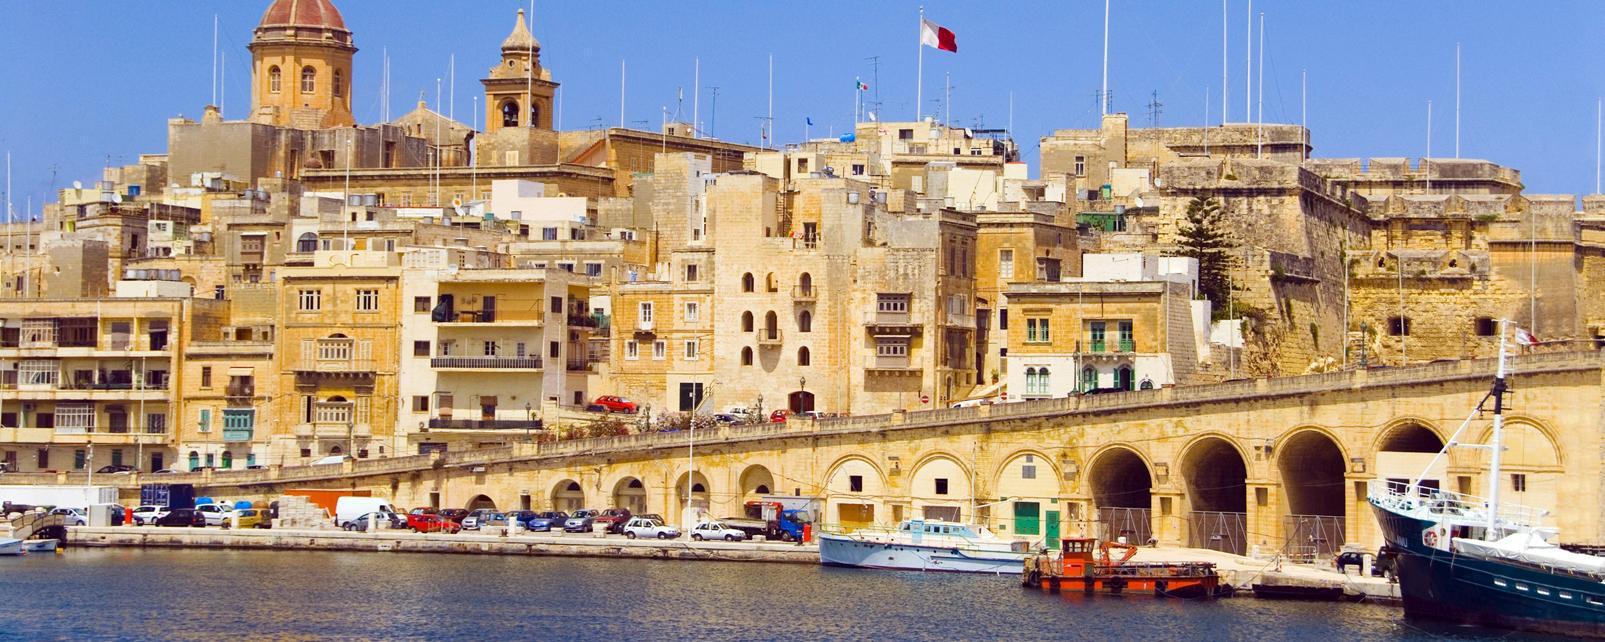 travel to valletta malta valletta travel guide easyvoyage. Black Bedroom Furniture Sets. Home Design Ideas